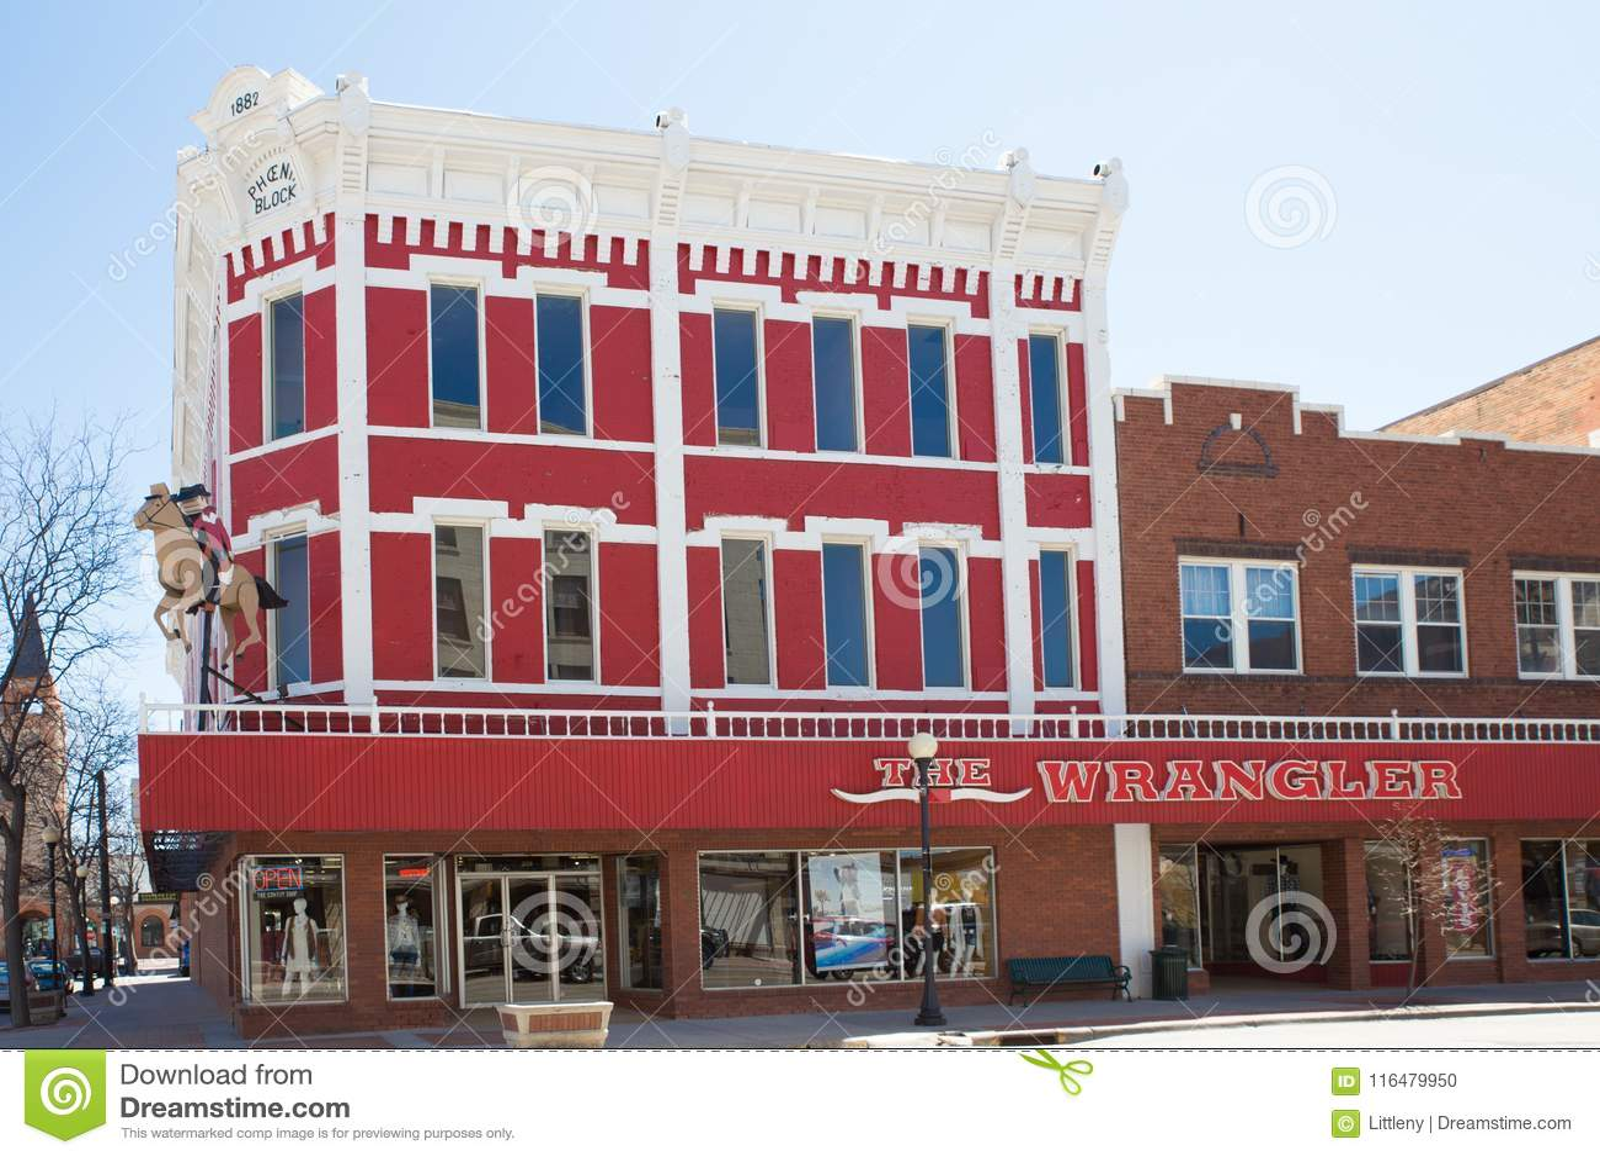 The Wrangler Store Cheyenne Wyoming Editorial Image - Image